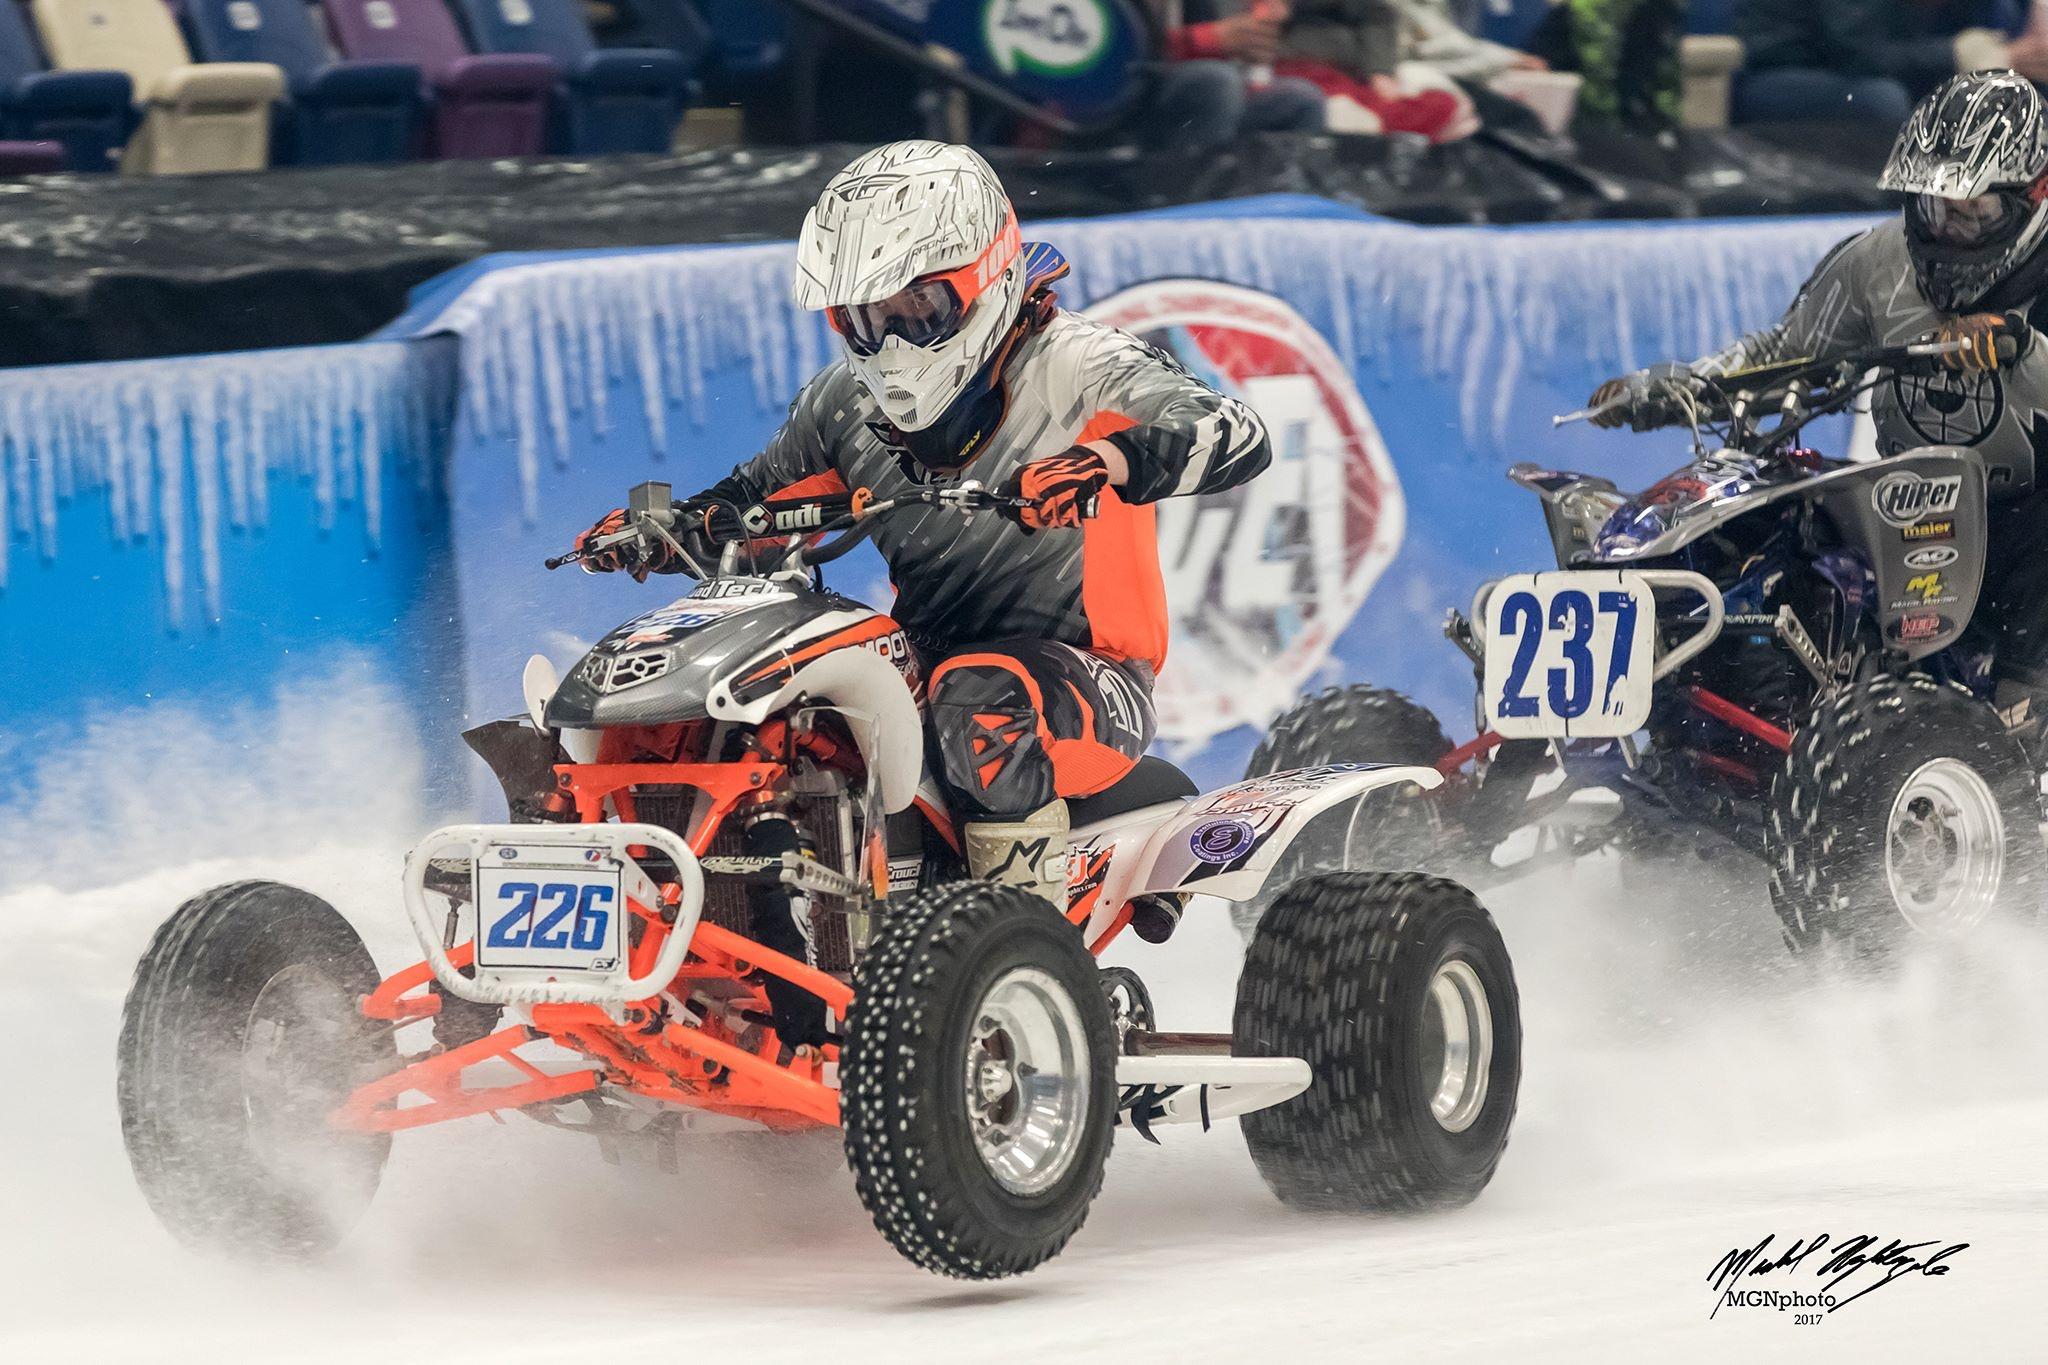 World Championship Ice Racing returns to Mohegan Sun Arena in Wilkes Barre on Jan 25